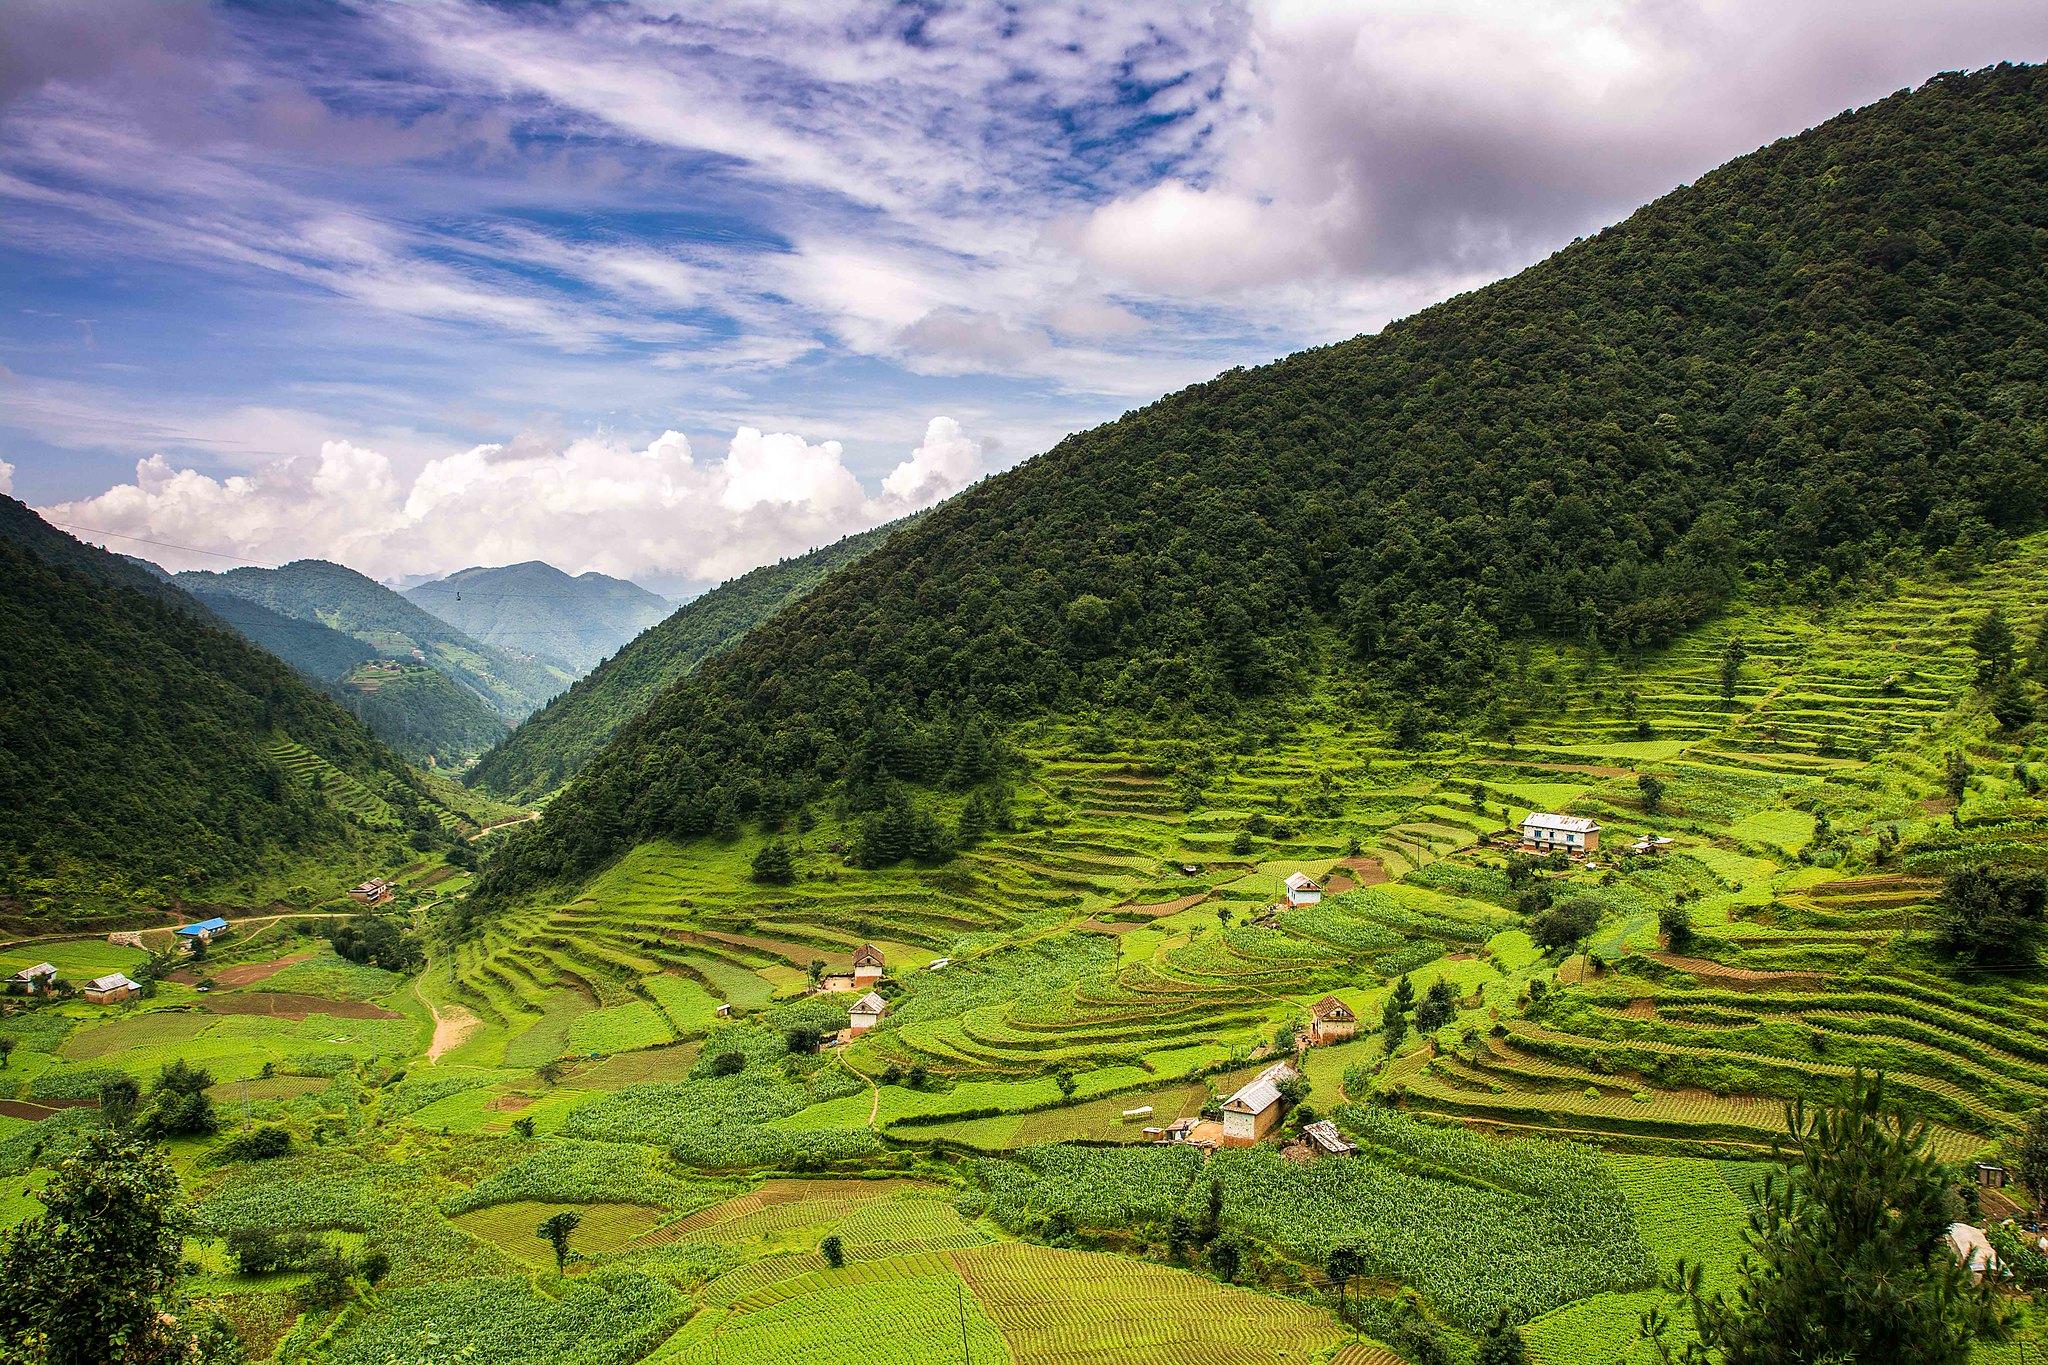 Rice fields in the hills of Nepal. Photo: Sharada Prasad CS